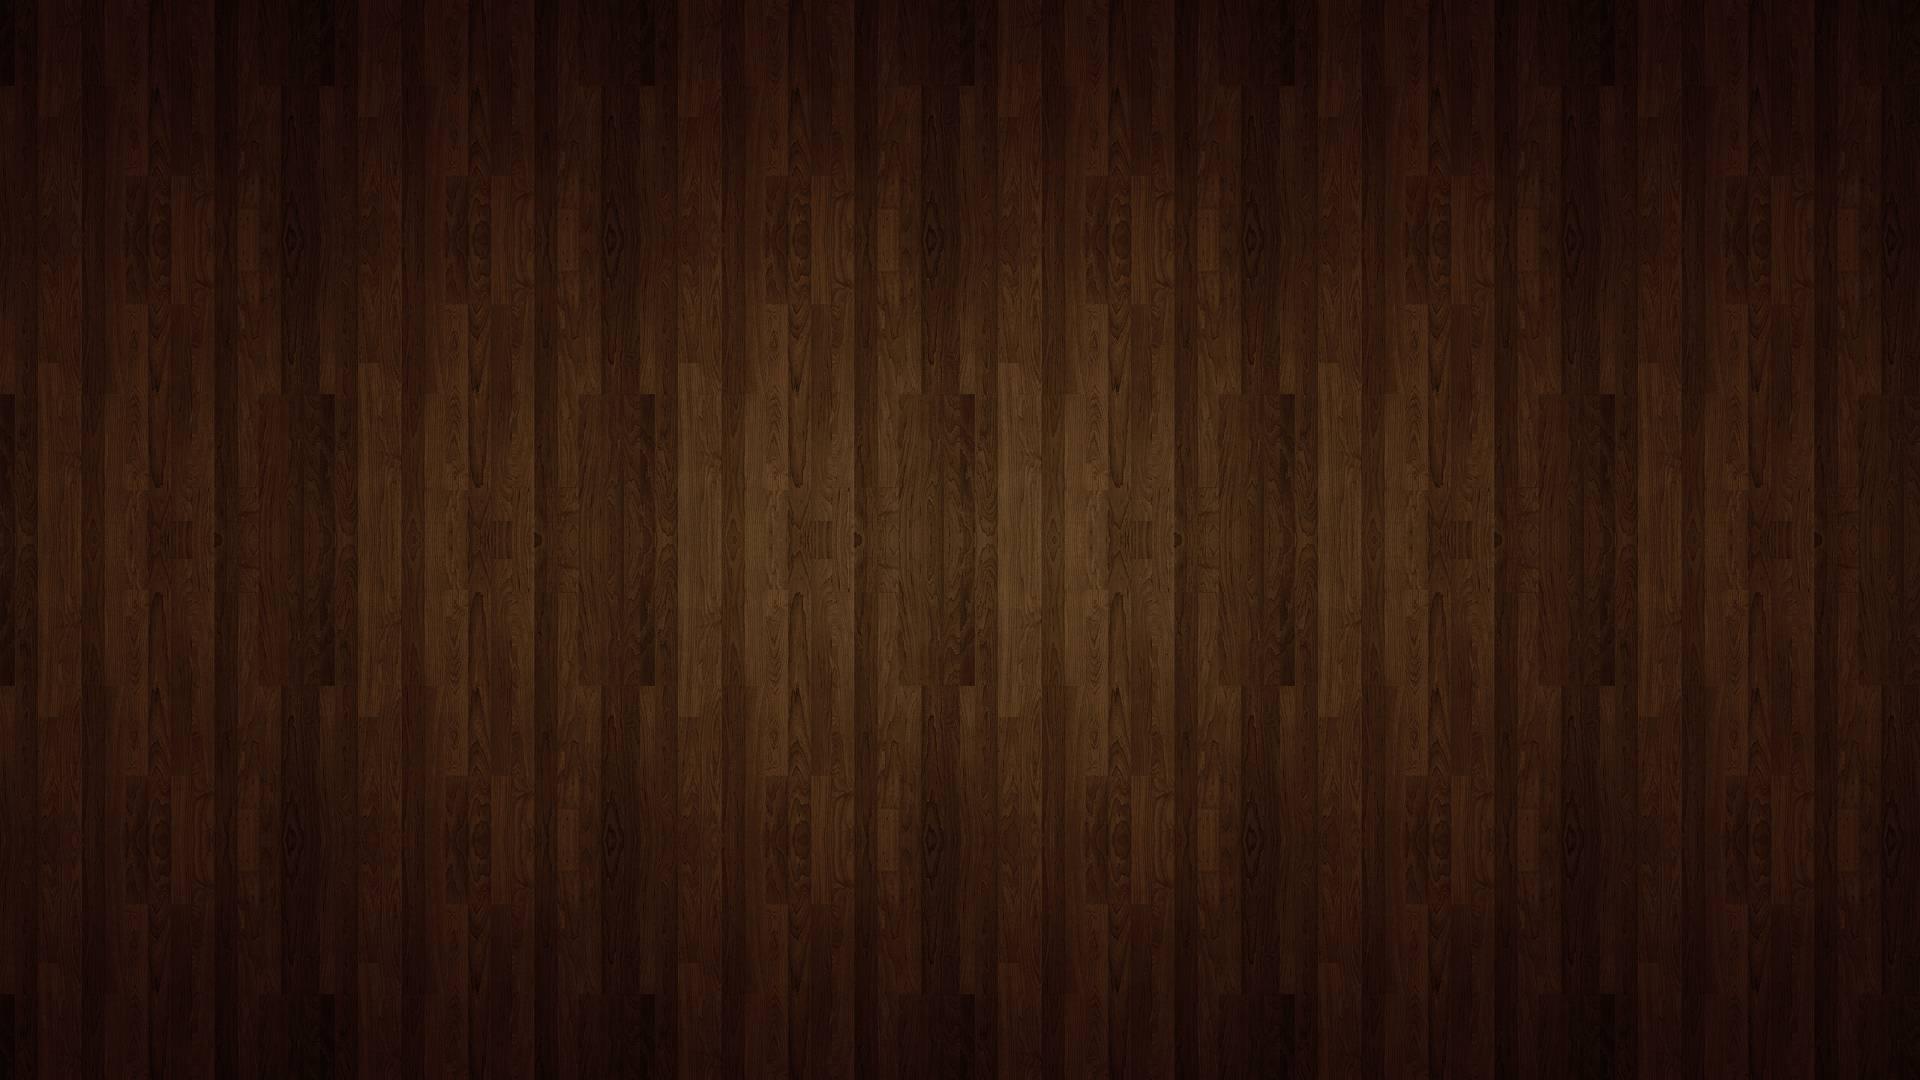 Wood Grain Desktop Wallpapers - - 137.8KB